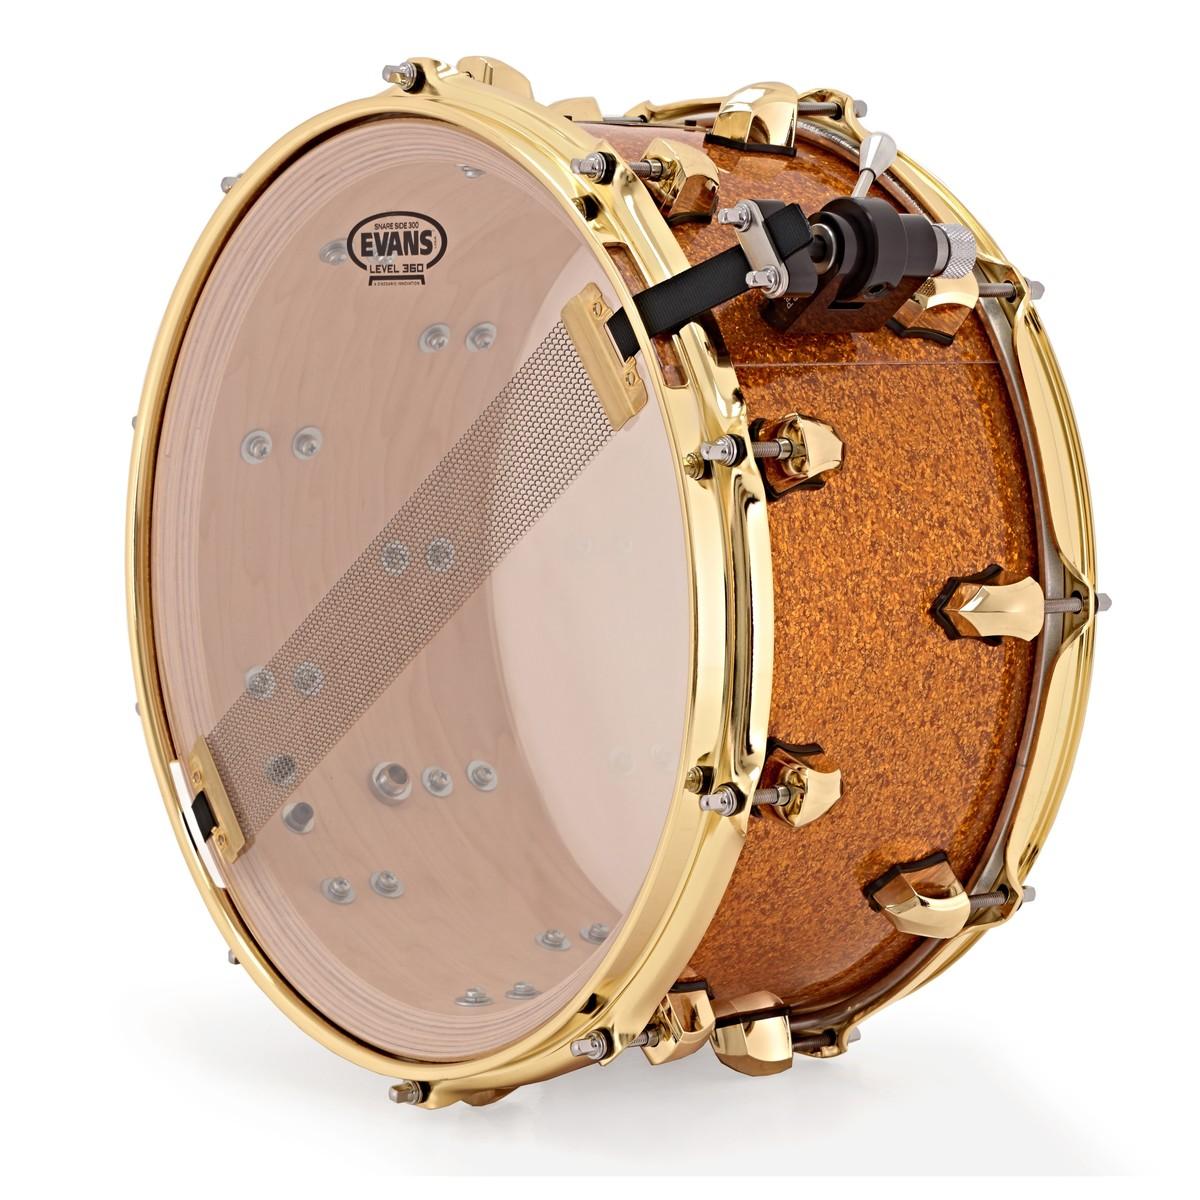 SJC Drums 14\'\' x 7\'\' Custom Snare Drum, Gold Glitter w/ Offset Lugs ...